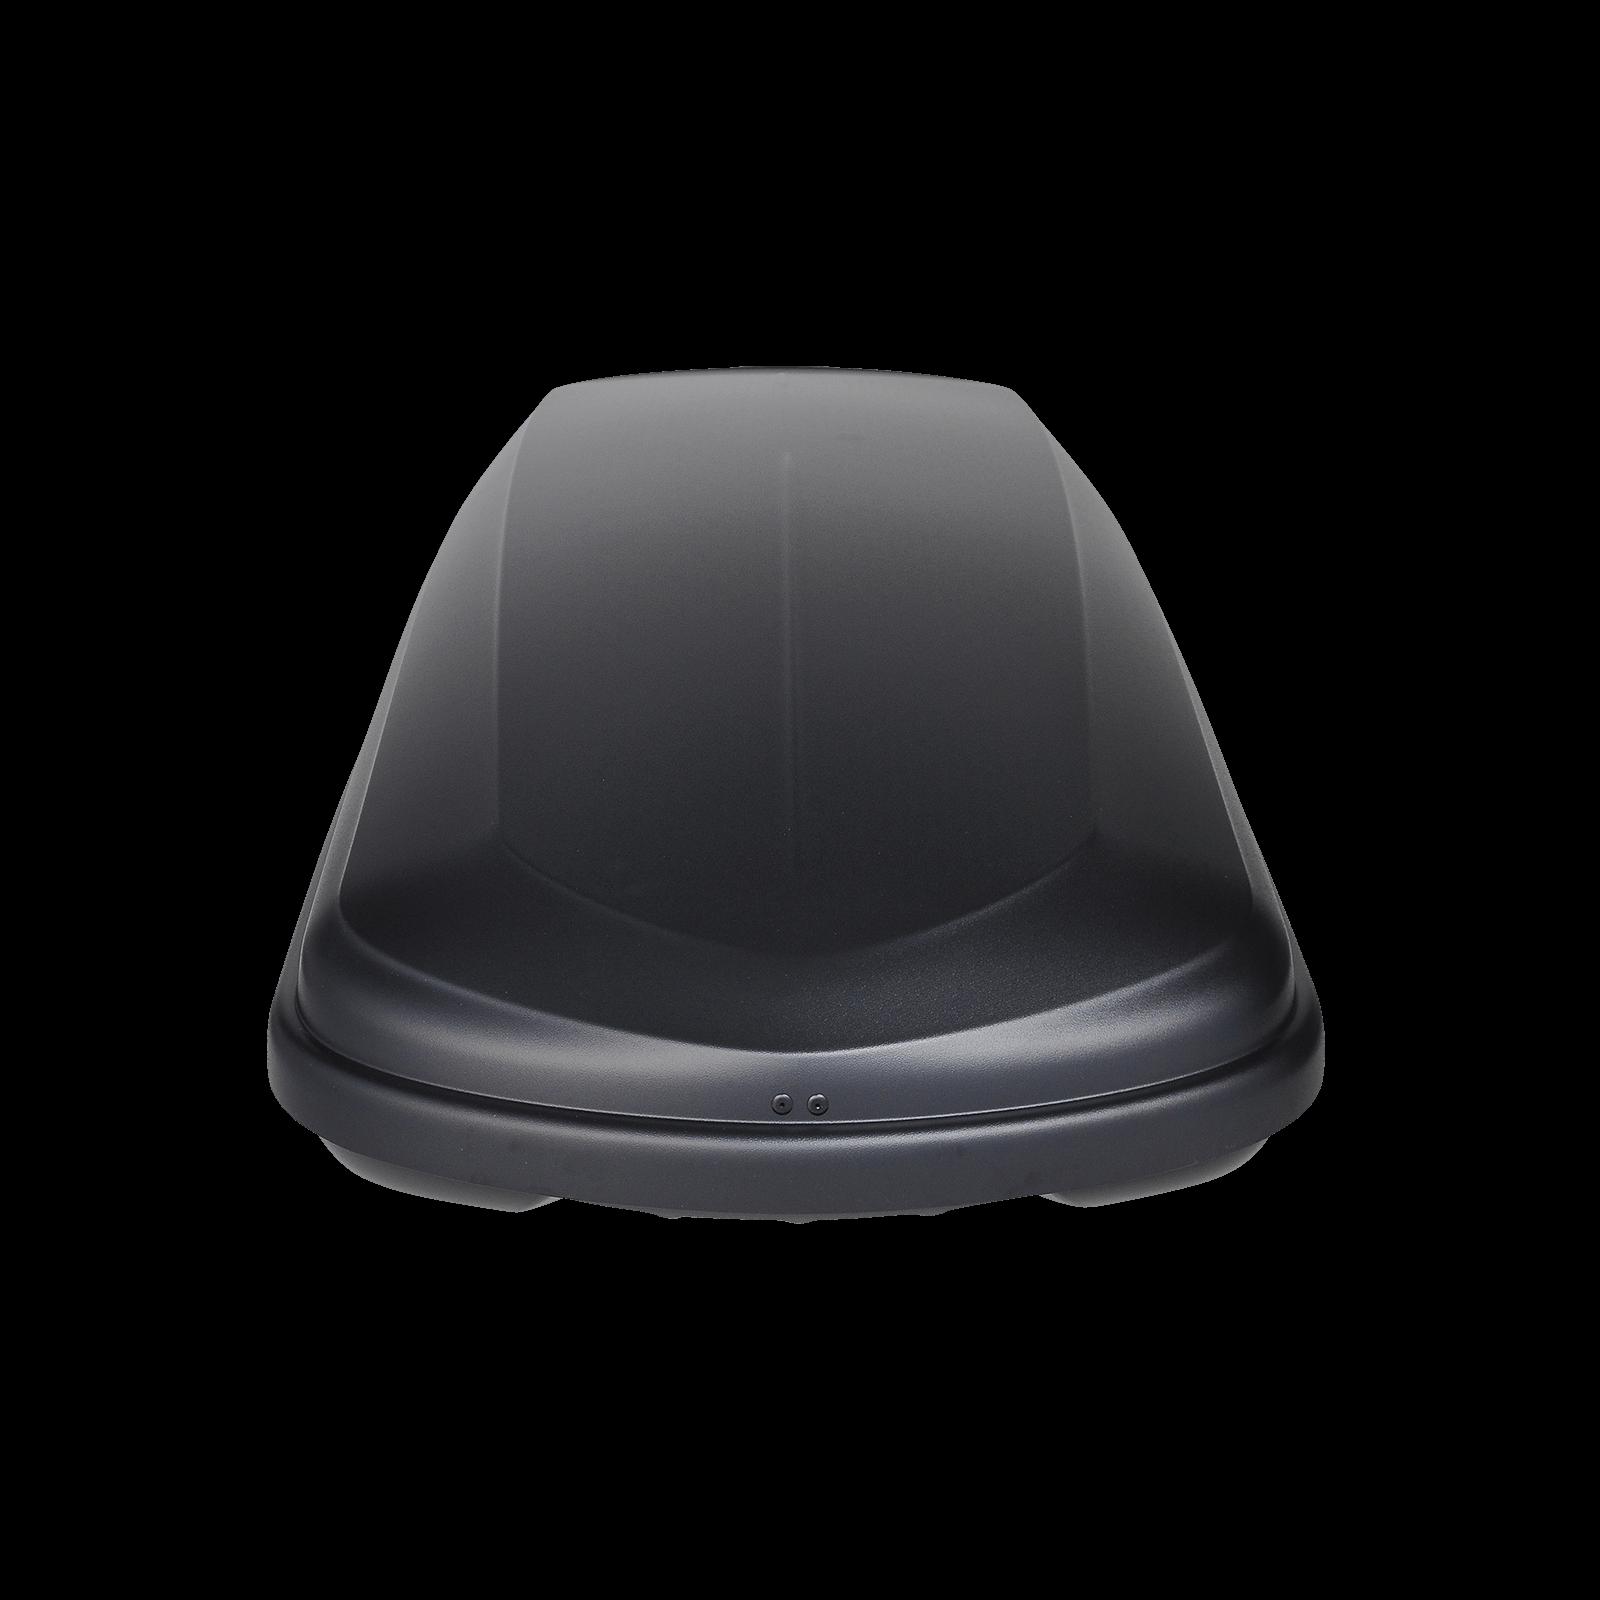 Dachbox Hapro Traxer 8.6 Anthracite - Bild 3